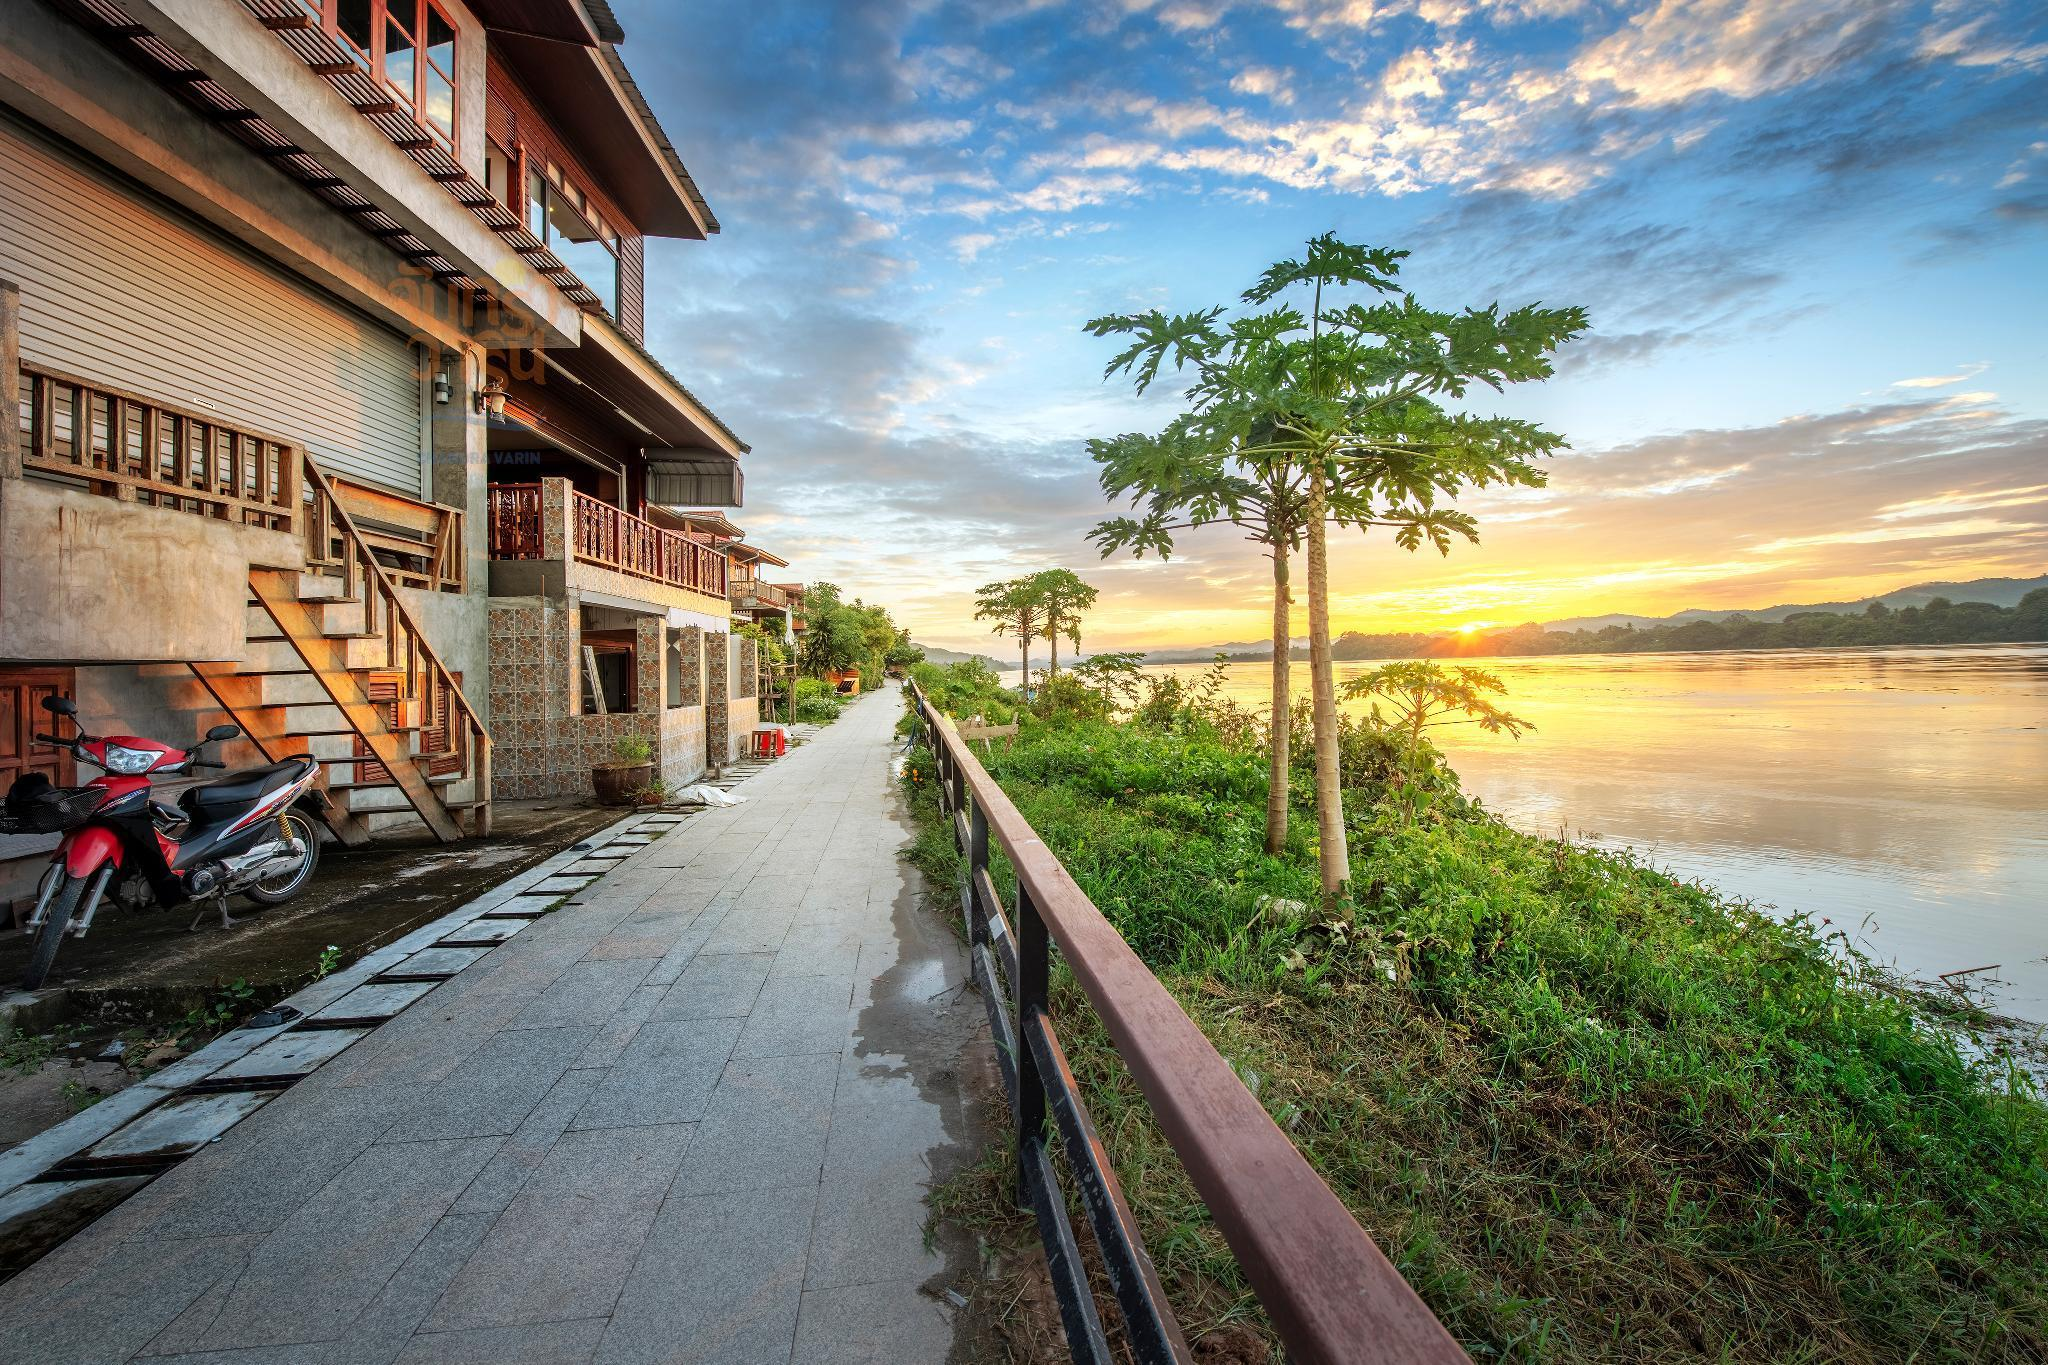 Chandra Varin Riverfront จันทรา วาริน ริเวอร์ฟรอนต์